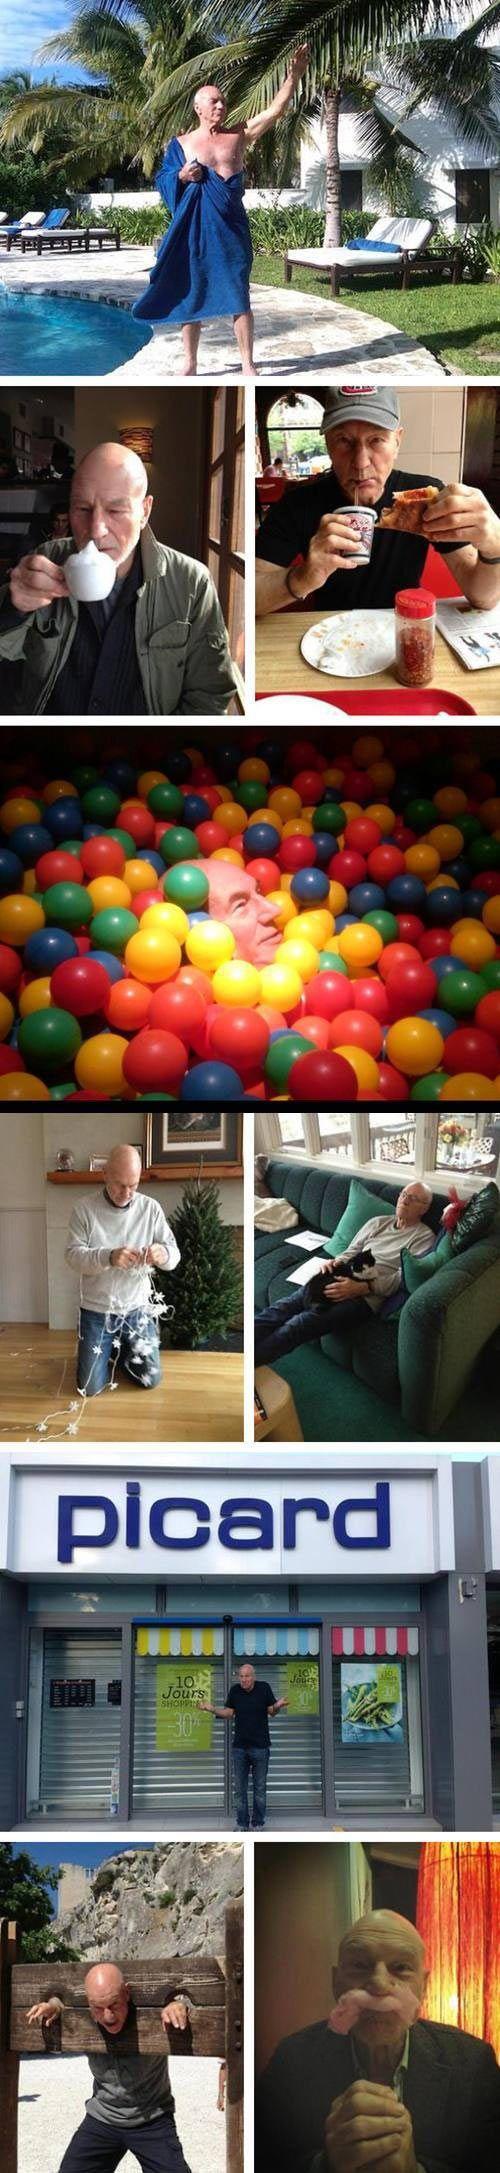 funny-Picard-Patrick-Stewart-photos